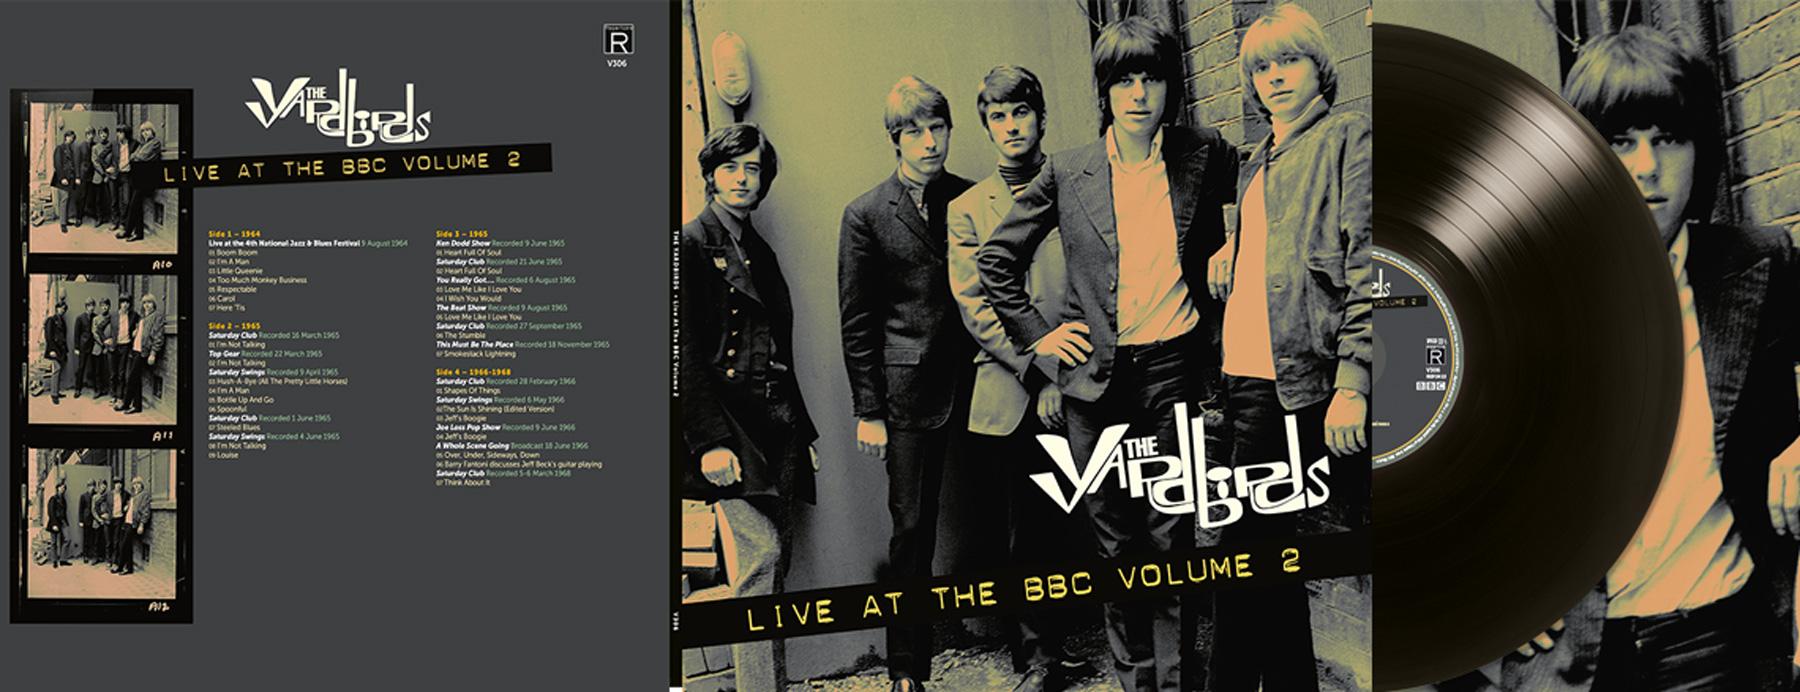 Live At The BBC Volume 2